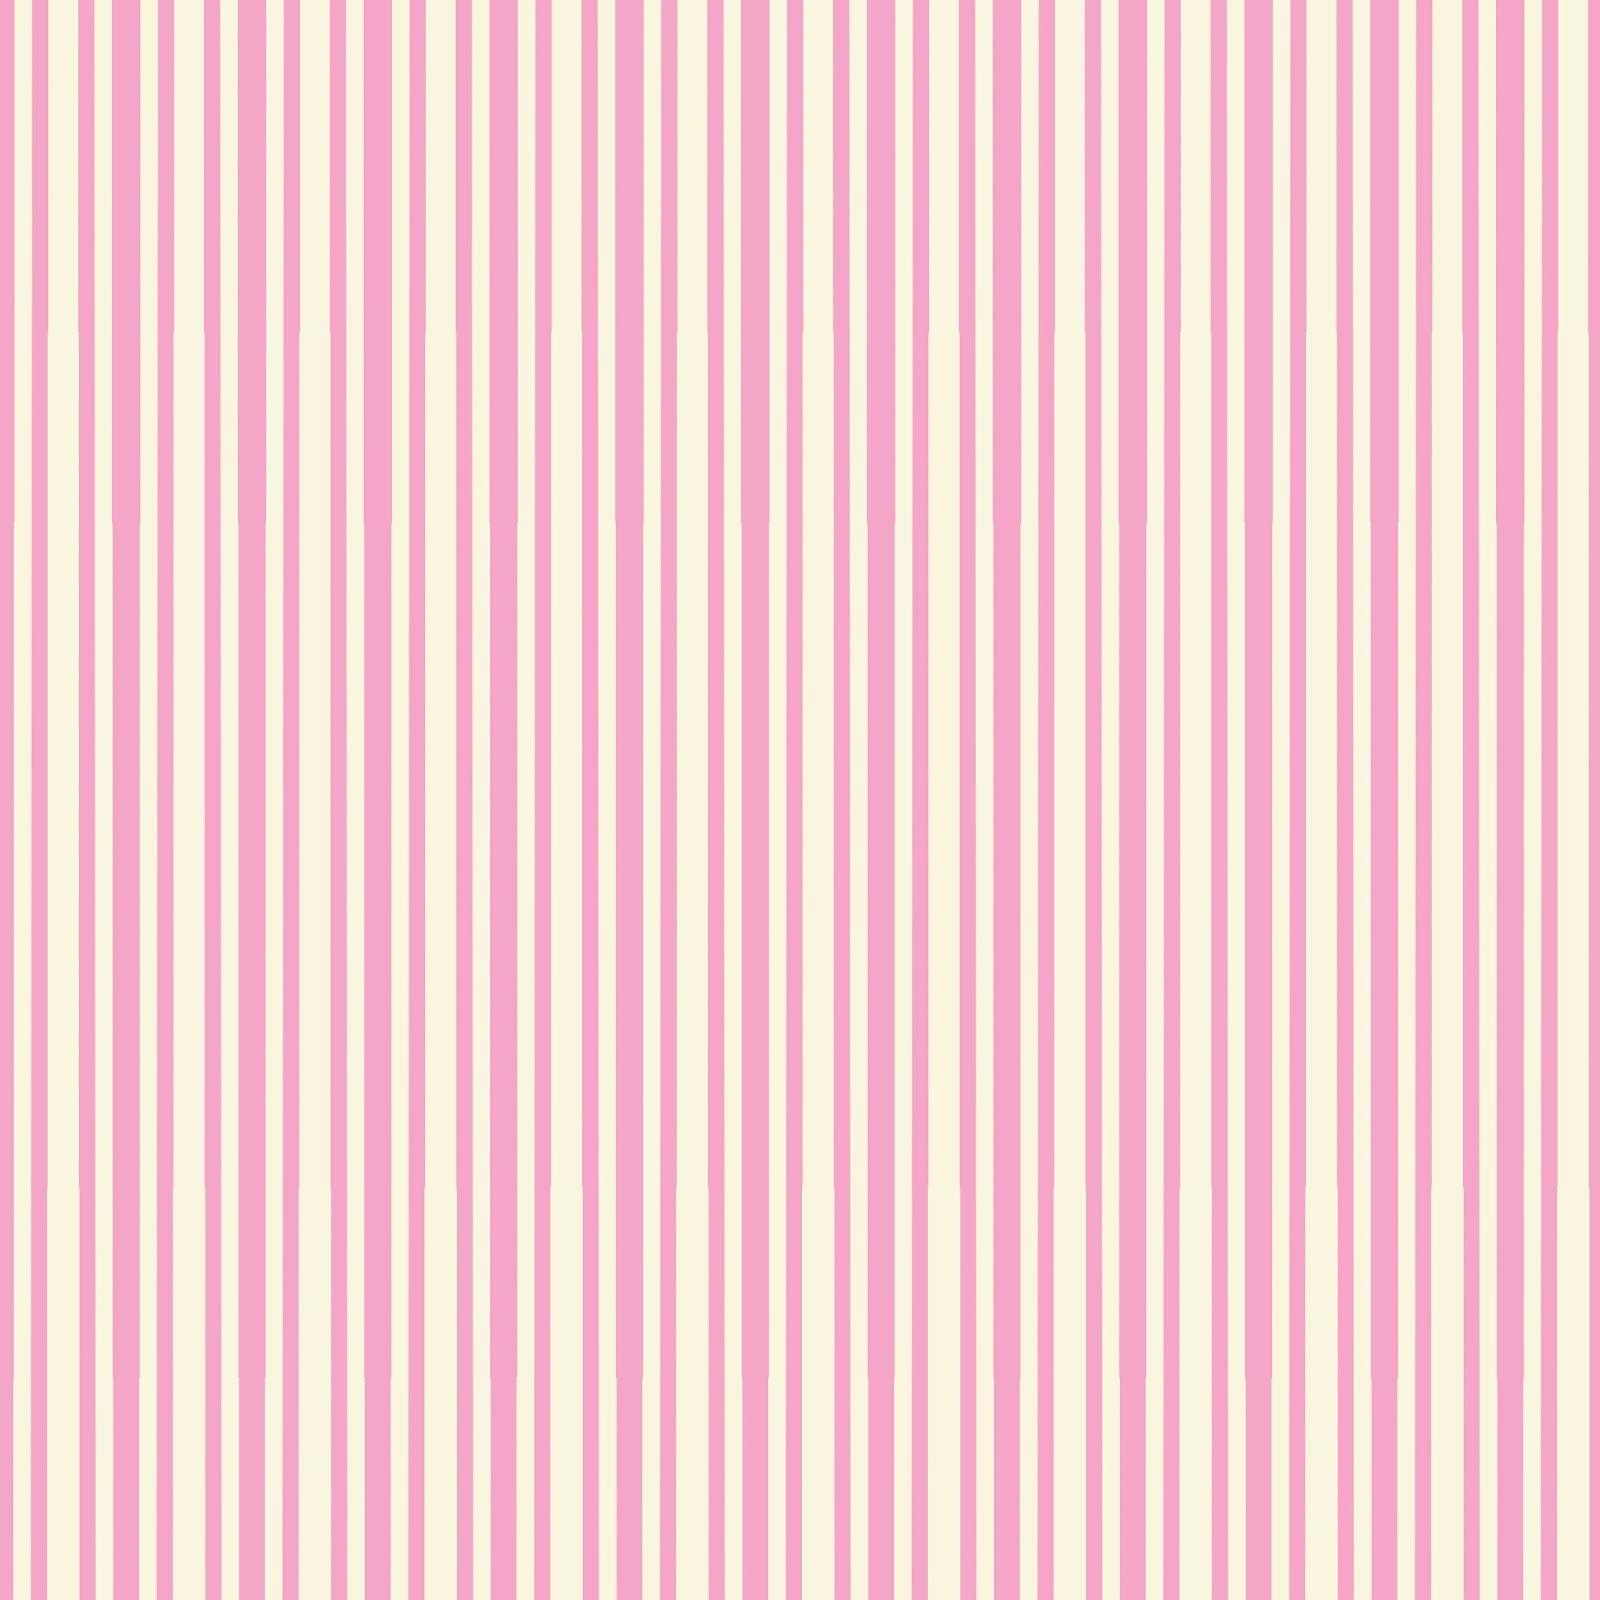 Scrapbook paper dollhouse wallpaper - Free Digital Scrapbook Paper Pink And Cream Ticking Stripes